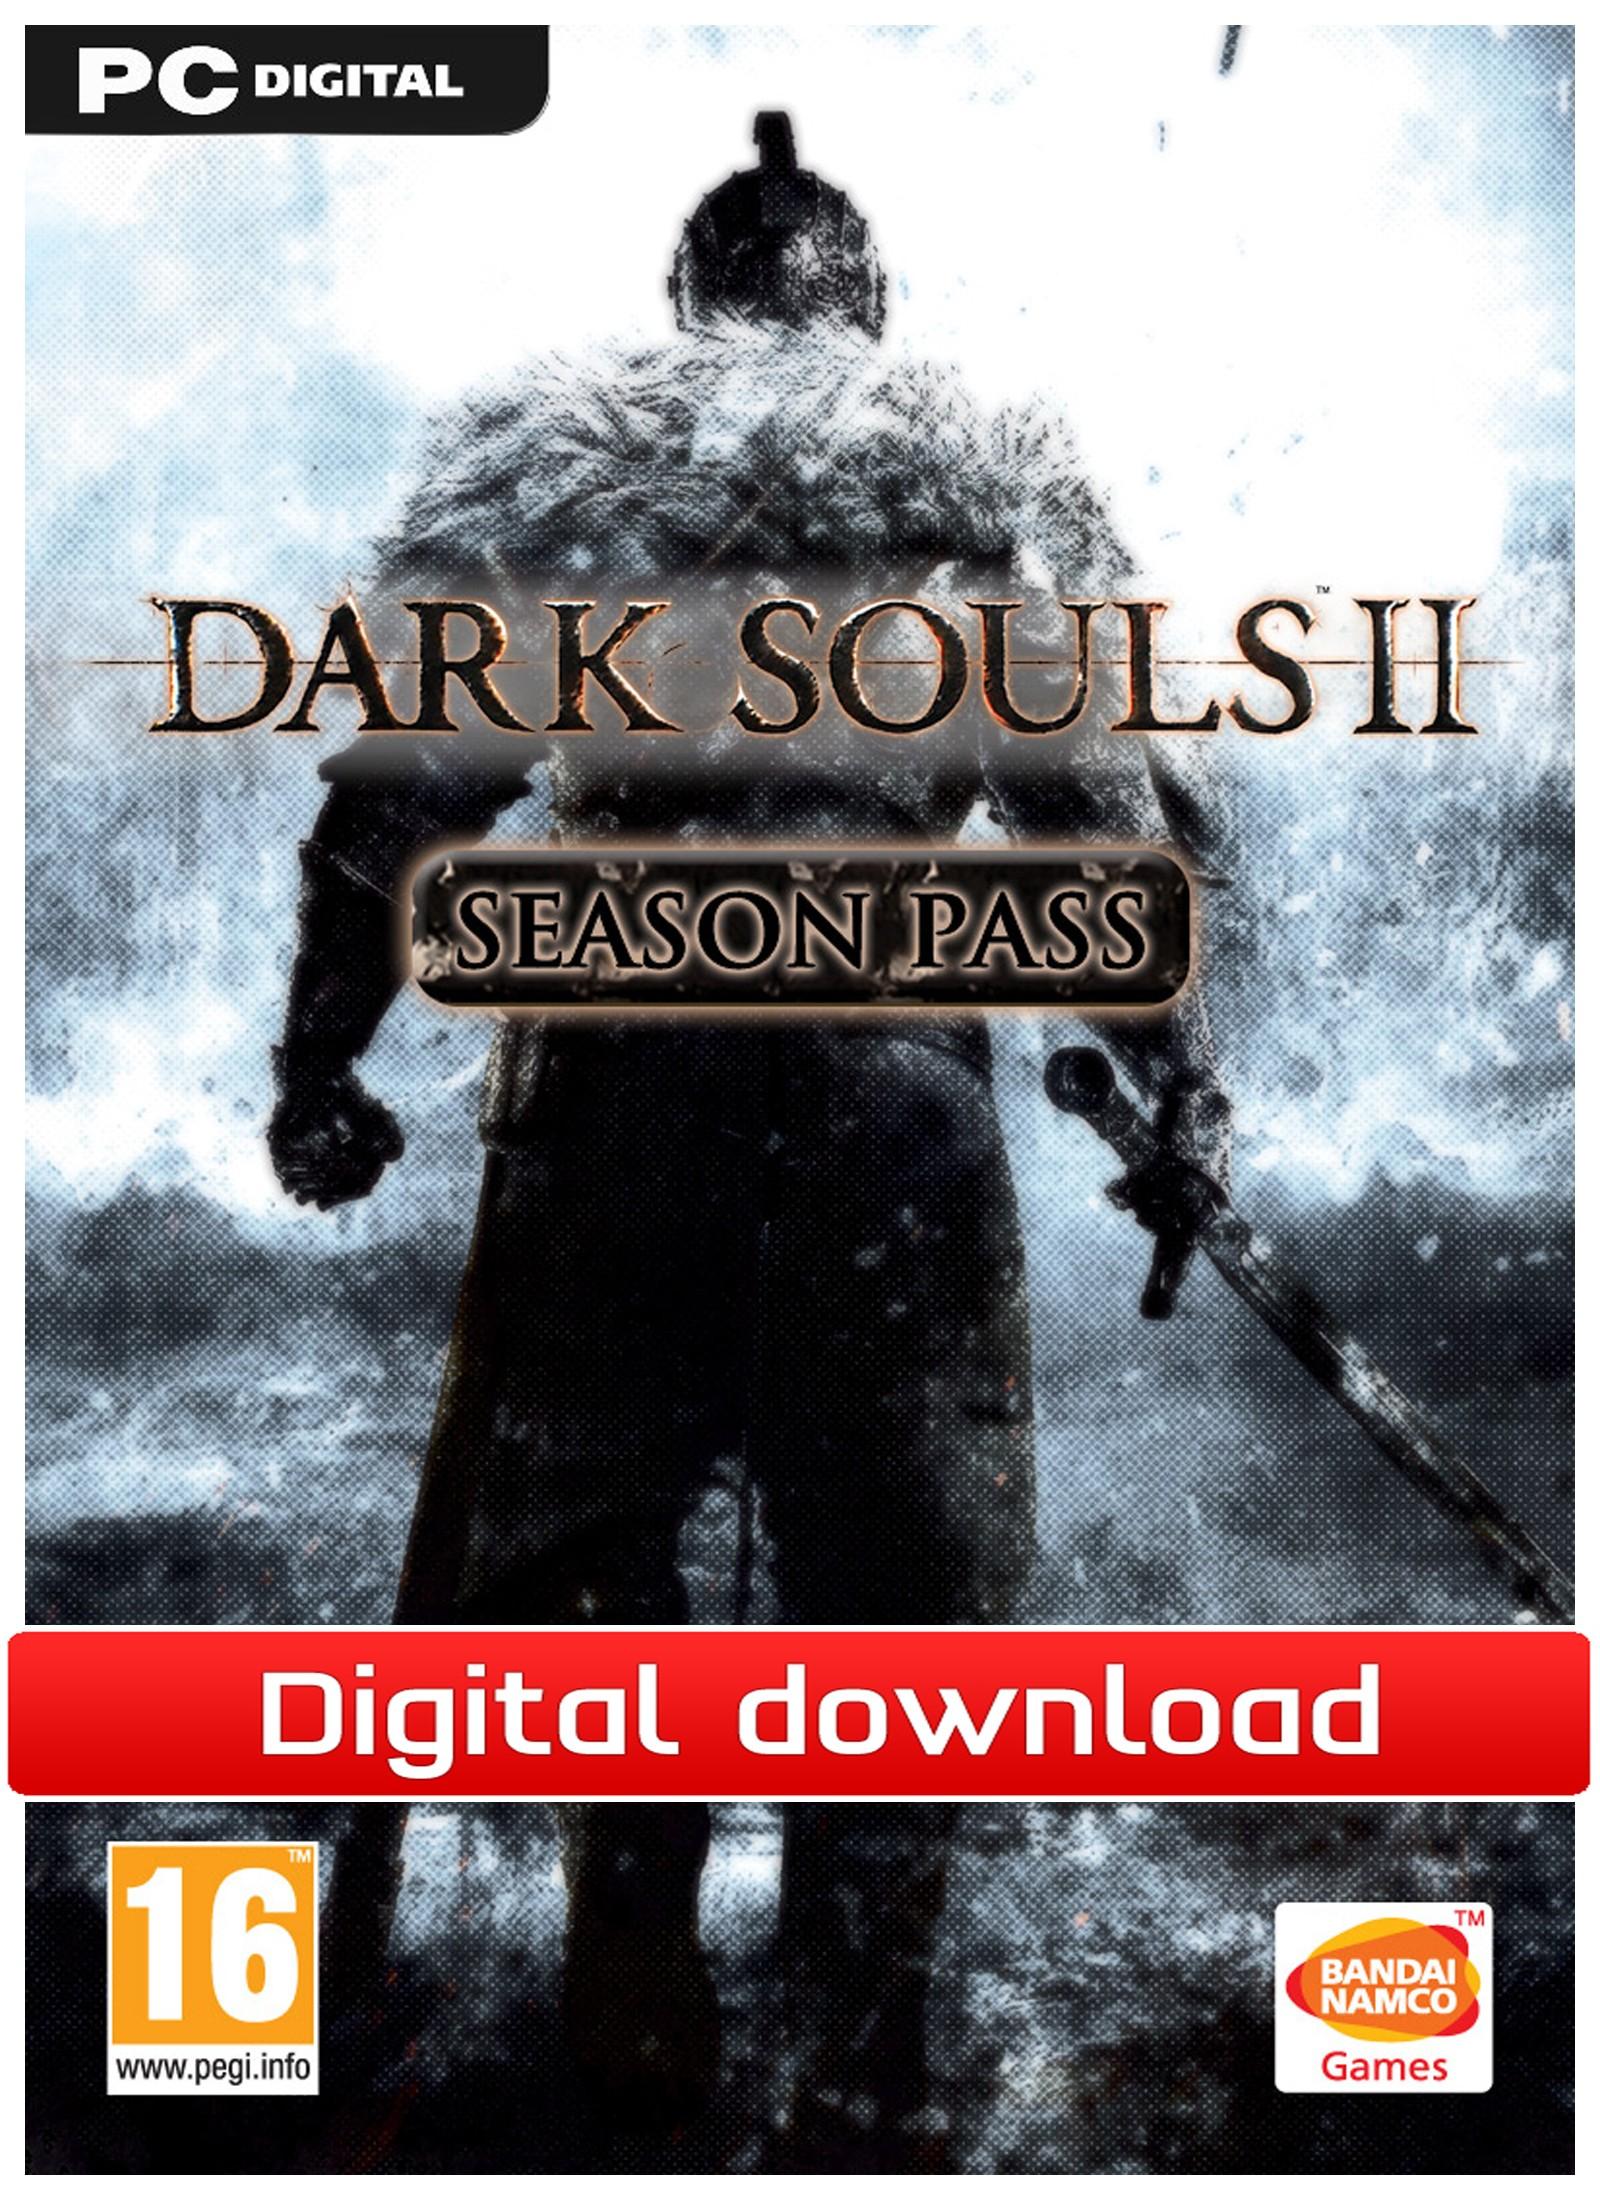 35440 : Dark Souls II Season Pass DLC (PC nedlastning)